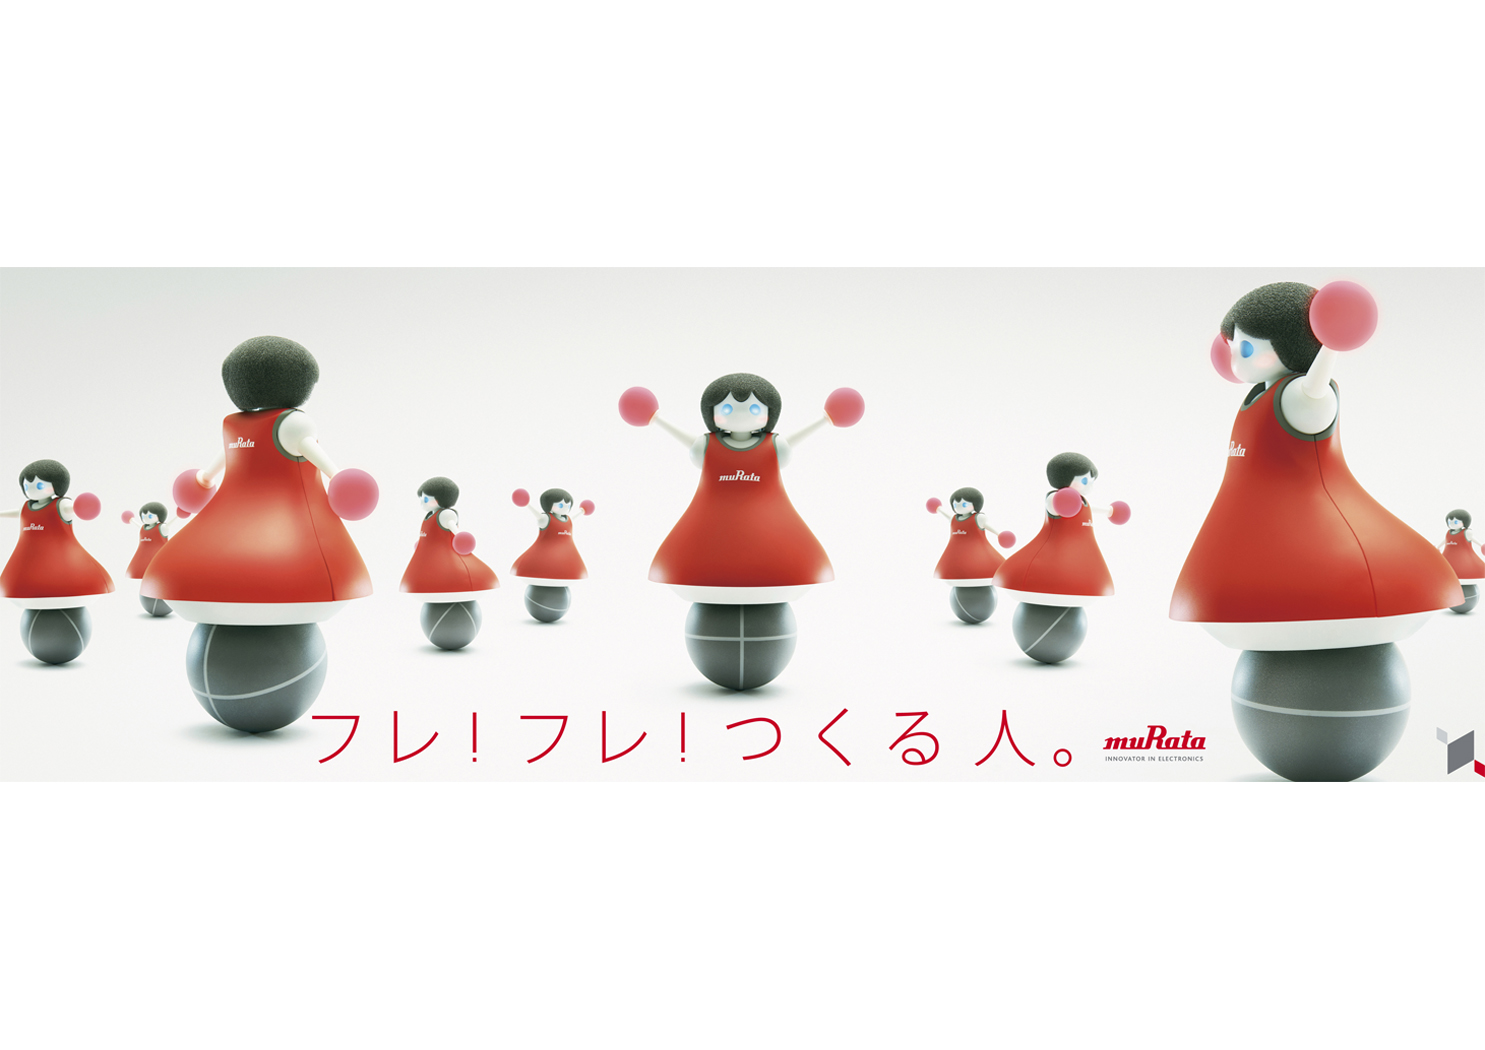 Murata Cheerleading Club Poster & Pamphlet